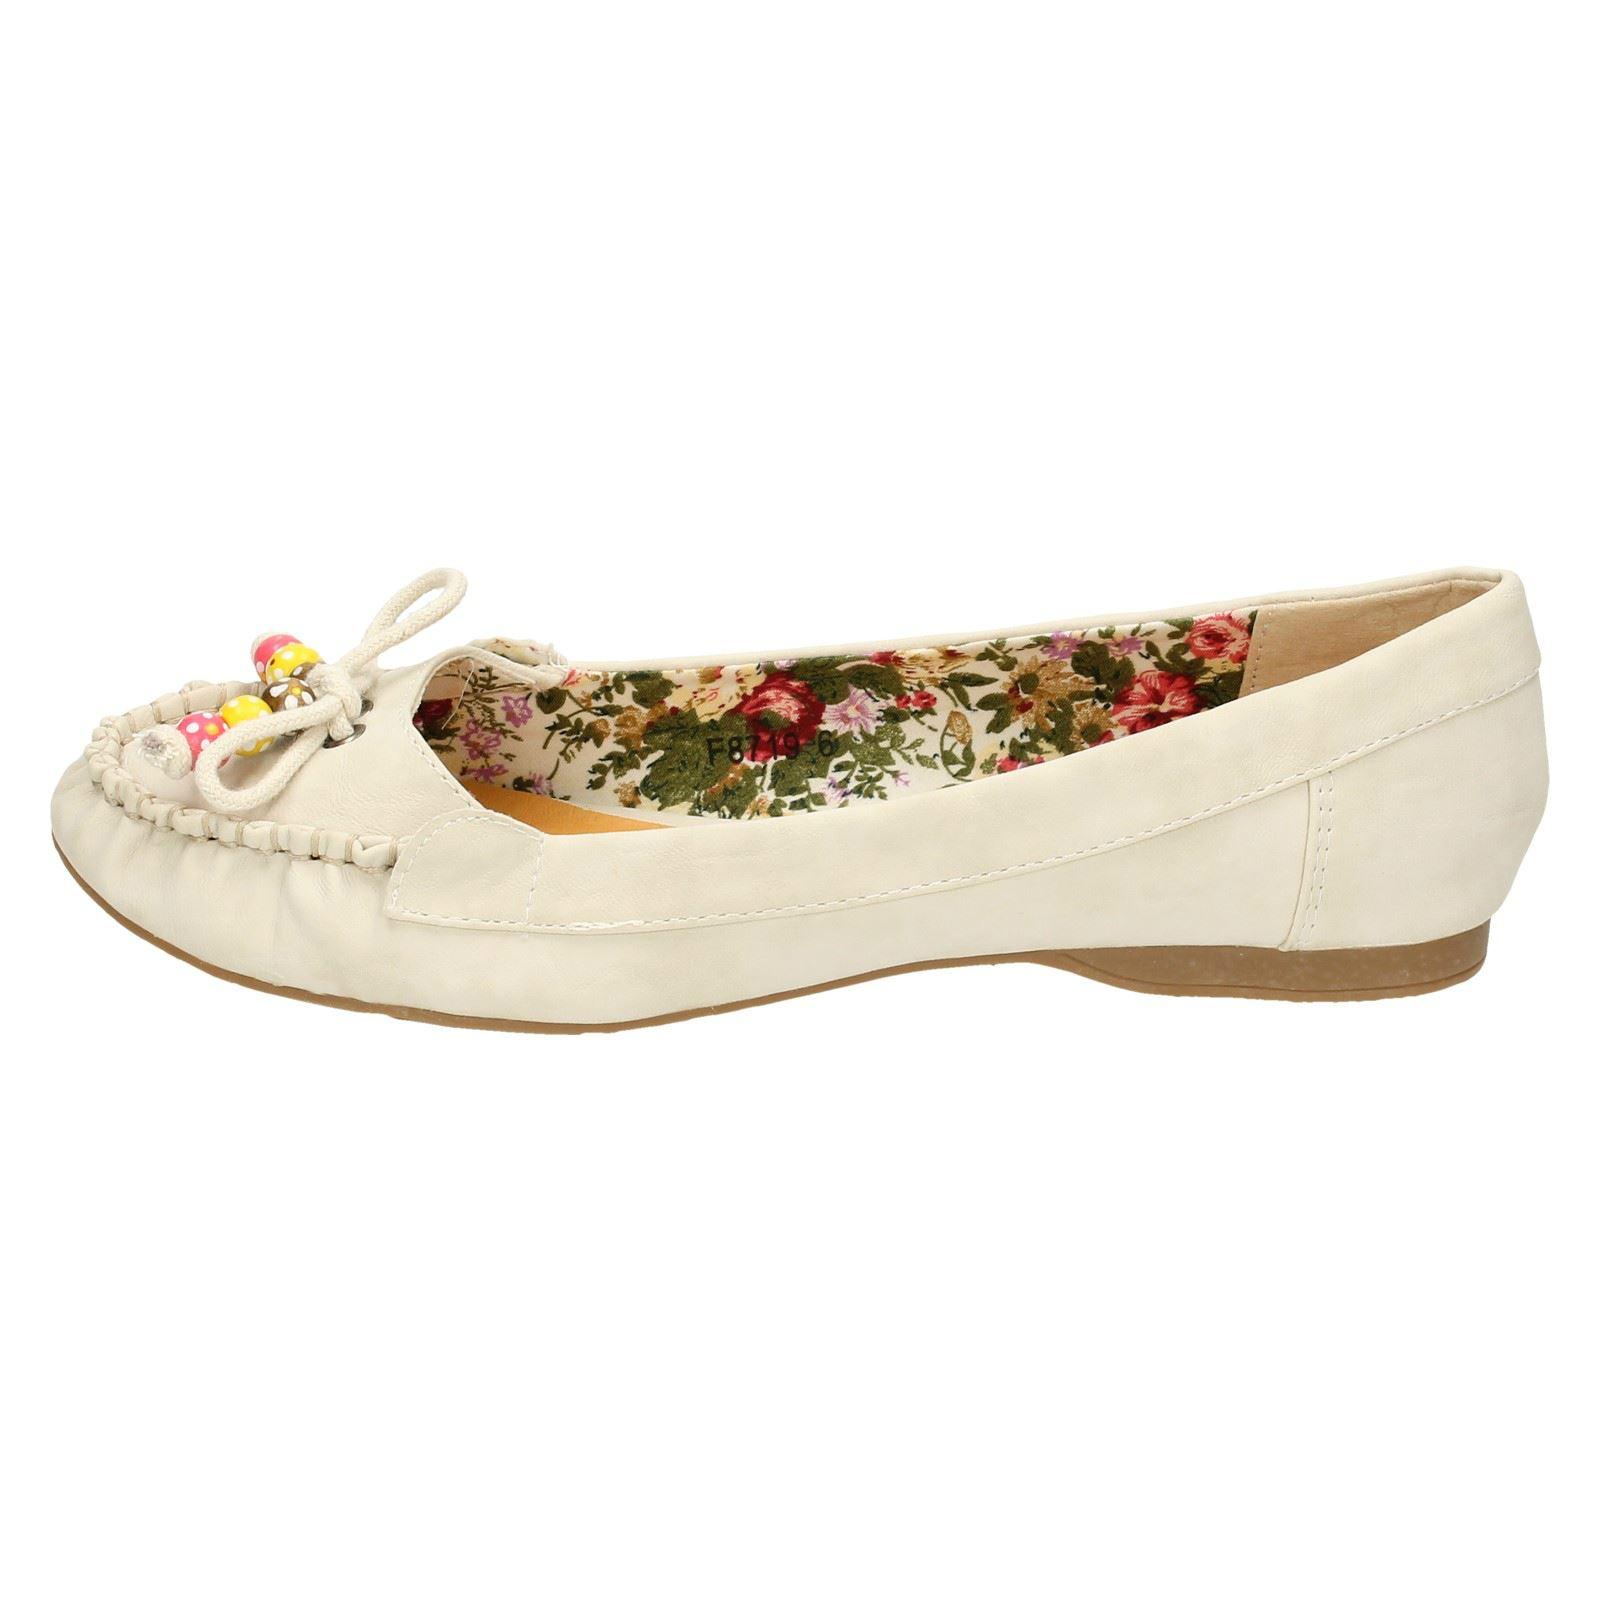 Spot on Femmes Plates Ballerine Chaussures